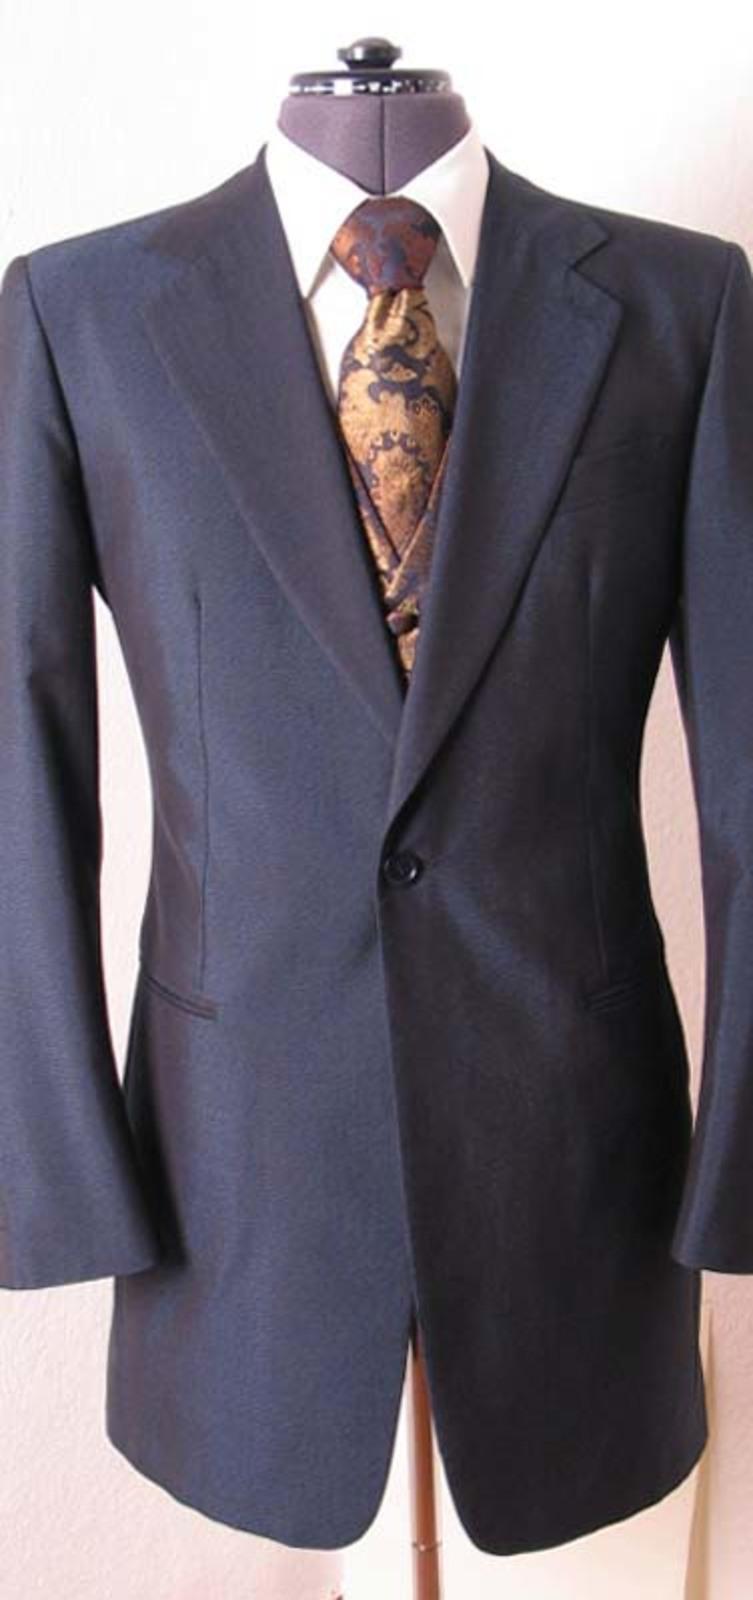 low priced 2786e 249eb Pal Zileri: Gehrock-Anzug komplett (50) [neuwertig]   Just ...